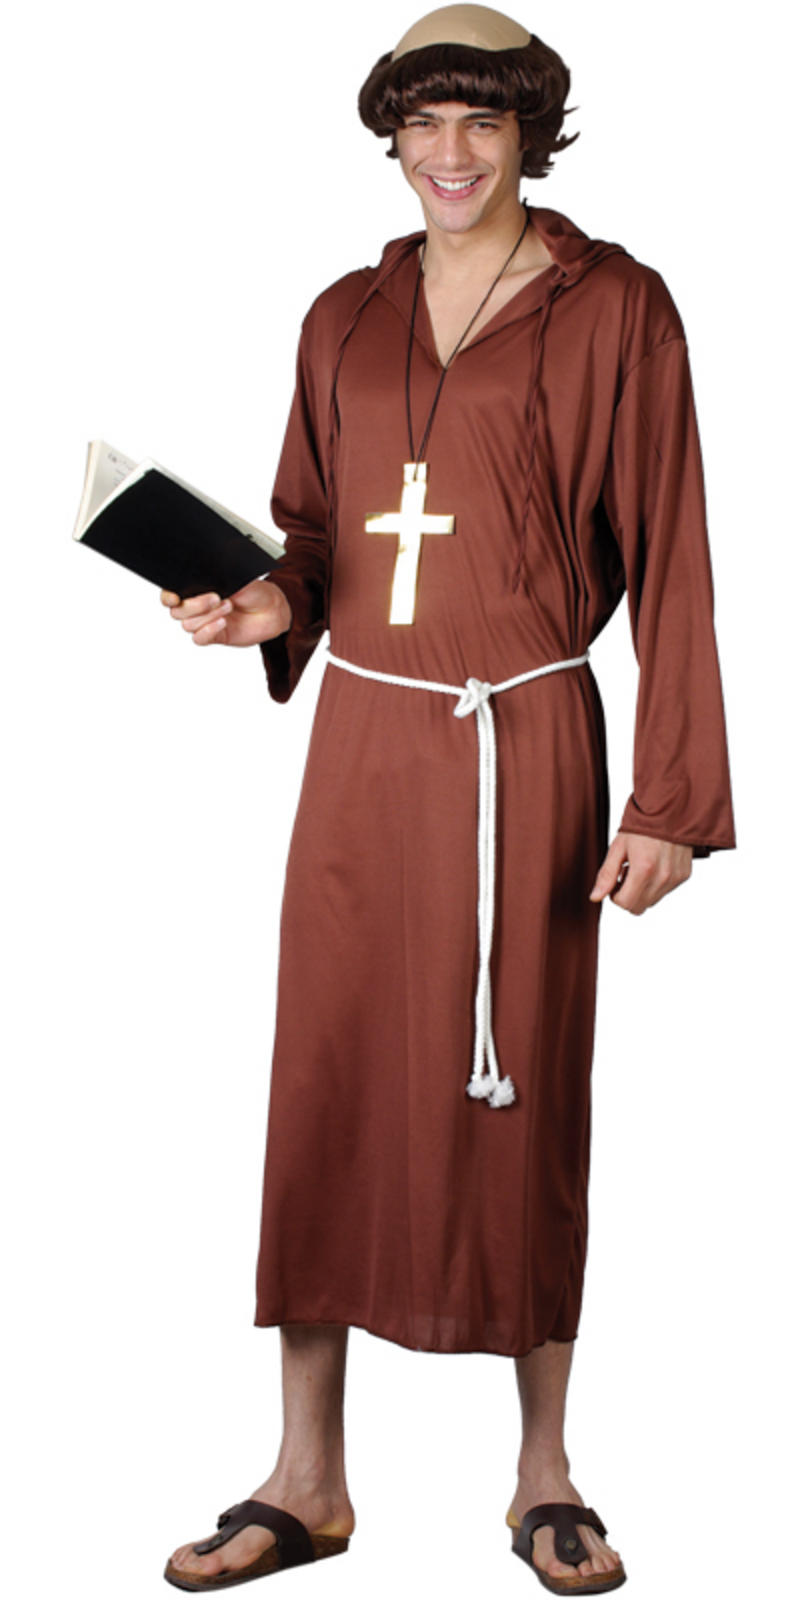 monk fryer tuck brown fancy dress costume by wicked xl. Black Bedroom Furniture Sets. Home Design Ideas